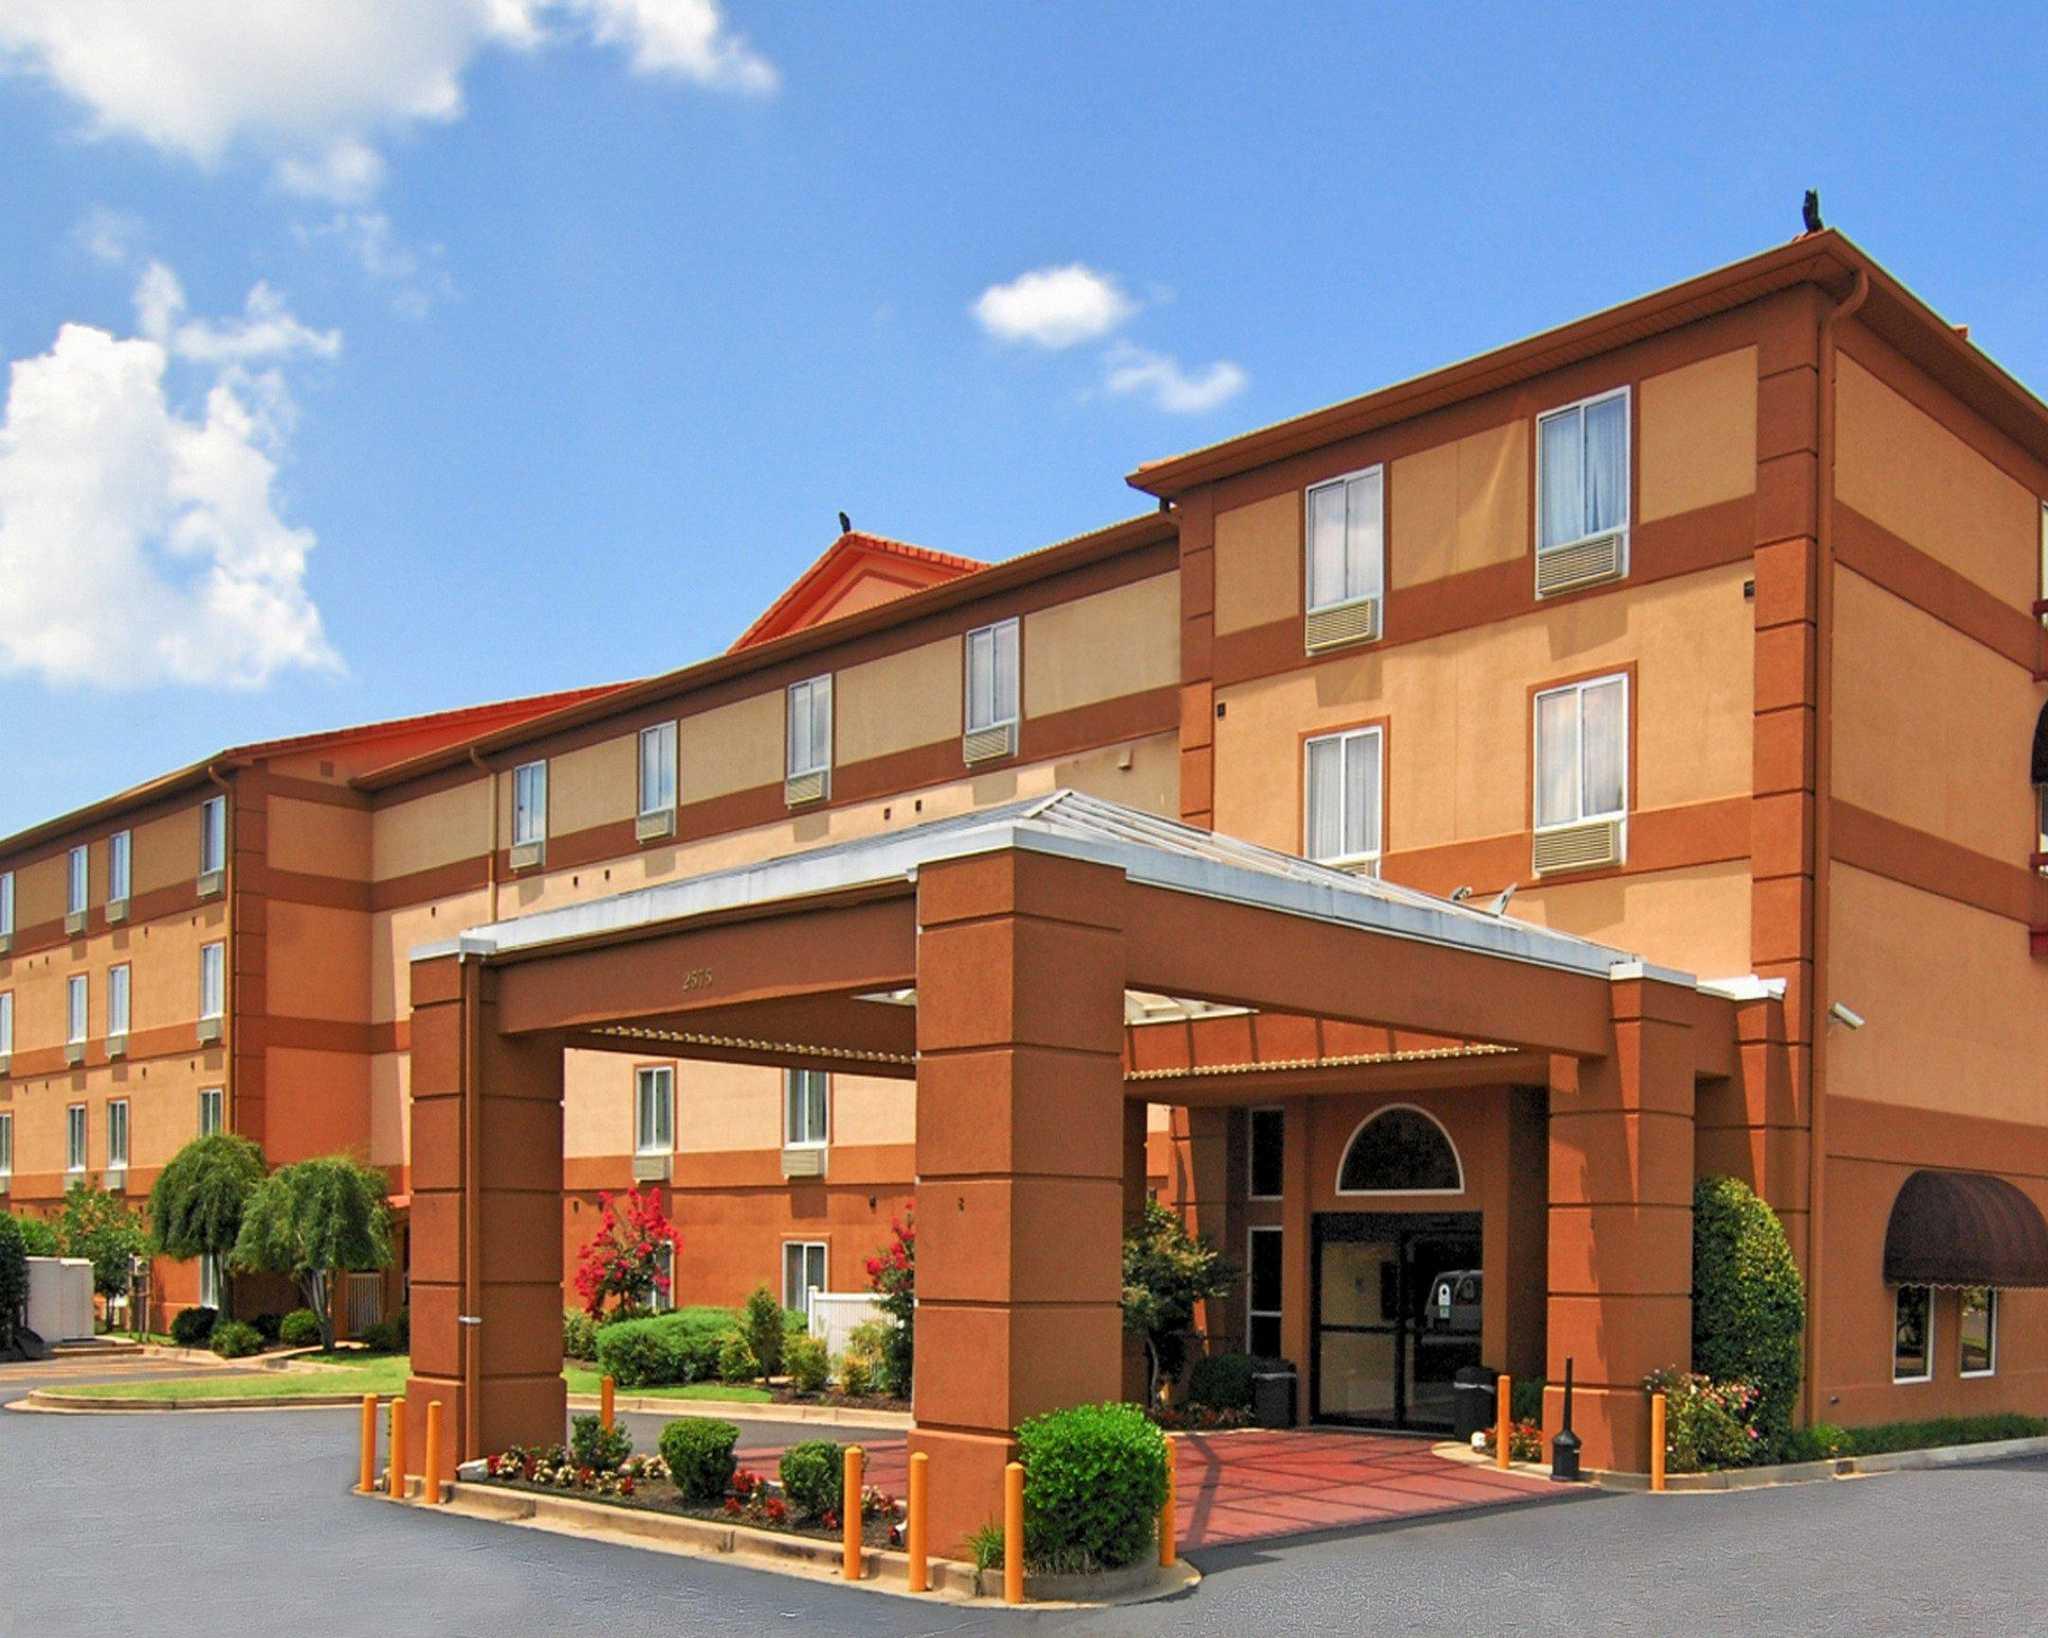 Quality Suites I-240 East-Airport - Memphis, TN 38118 - (901)365-2575 | ShowMeLocal.com